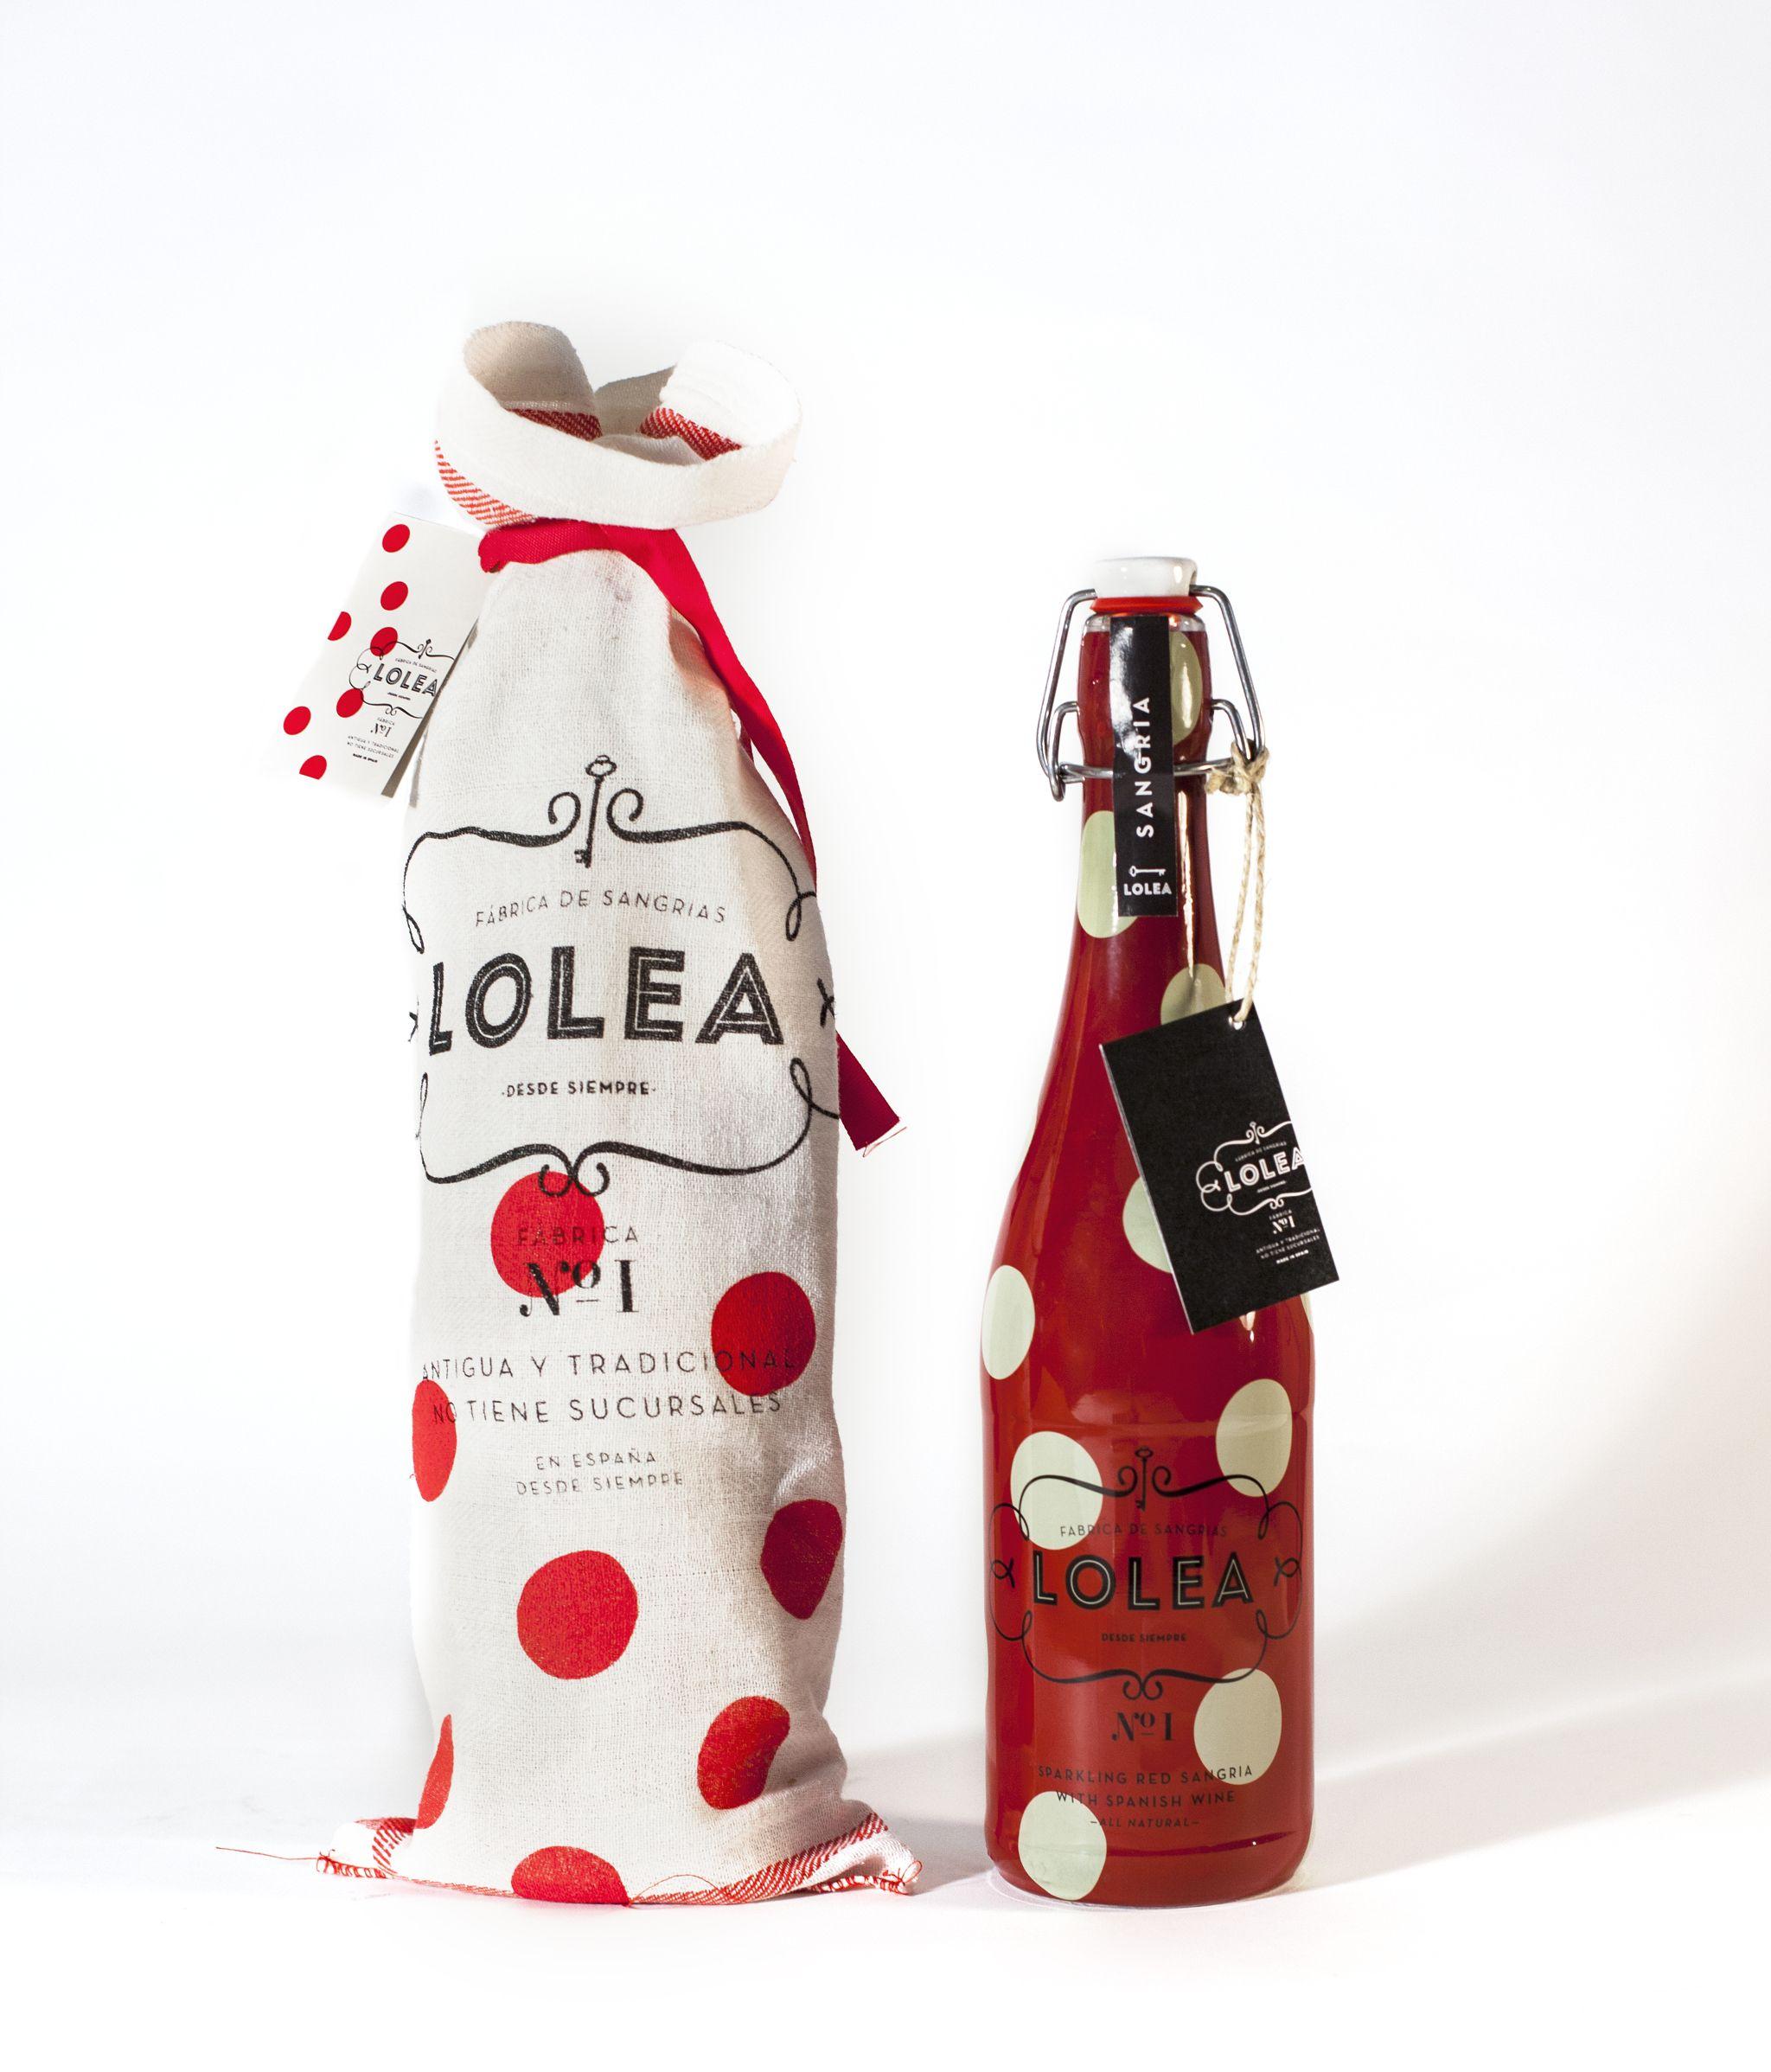 Sangria Lolea Diseno Grafico Comunicacion Campanas Publicitarias Identidad Corporat Graphic Design Packaging Packaging Labels Design Food Packaging Design